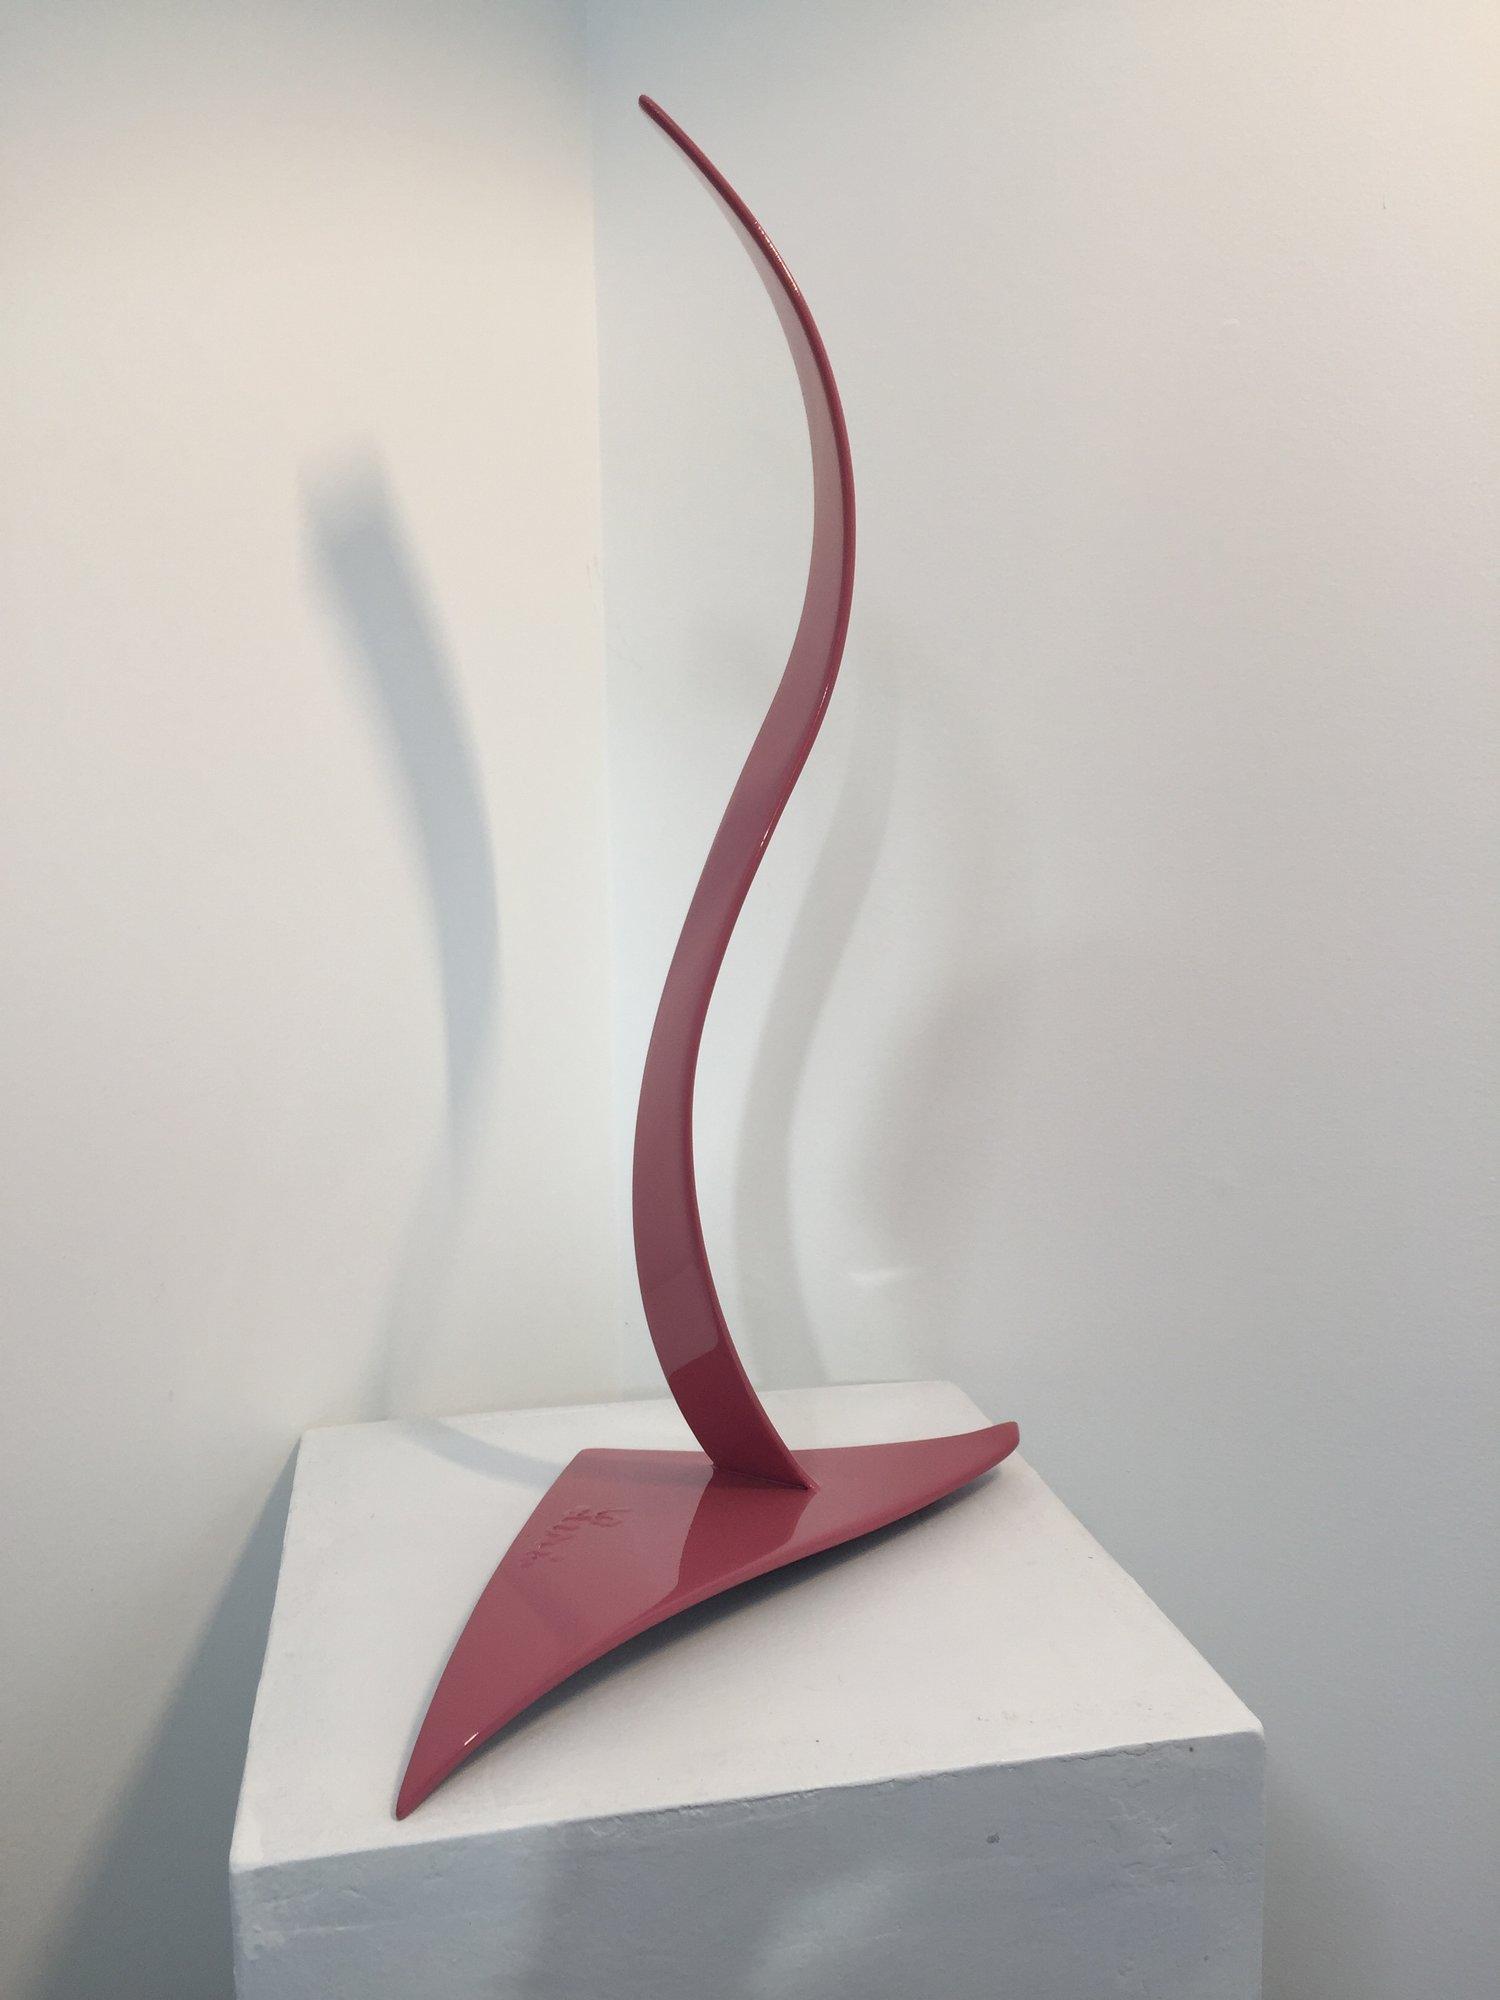 Signorina, 2013, painted welded steel, 20 x 12 x 6 in, $3,500